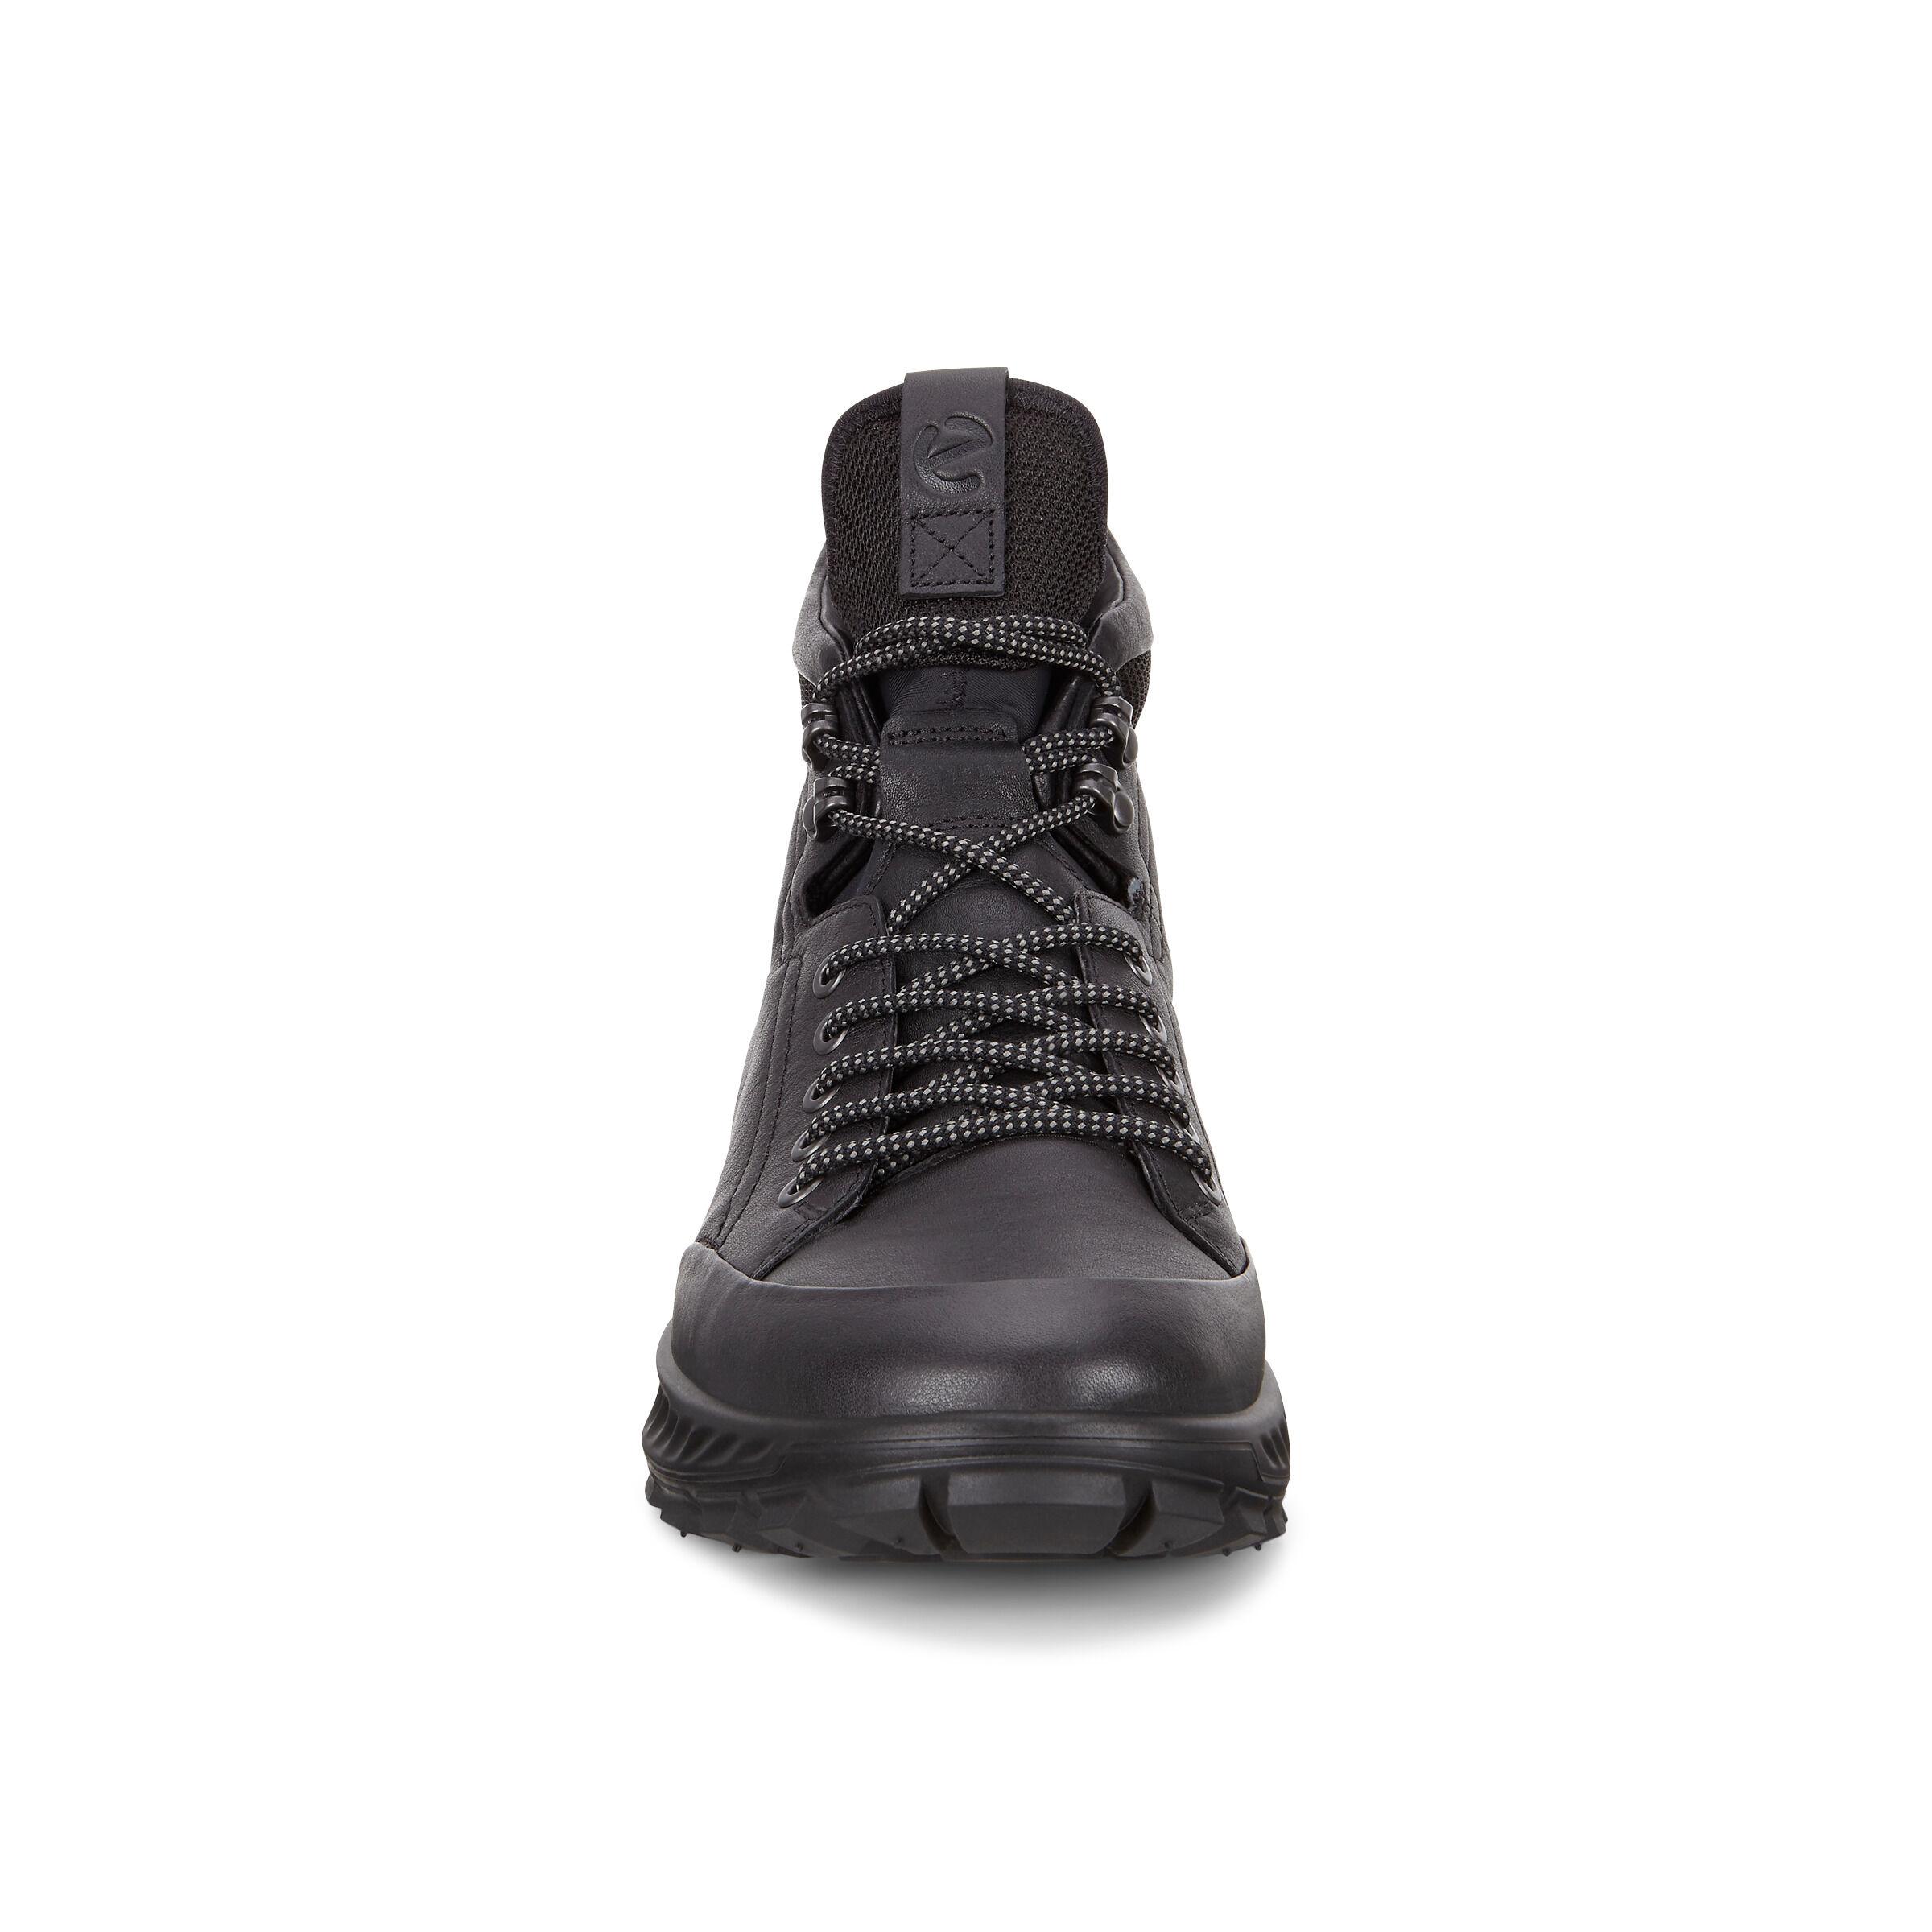 ECCO EXOSTRIKE Hydromax | Men's Outdoor Shoes | ECCO® Shoes